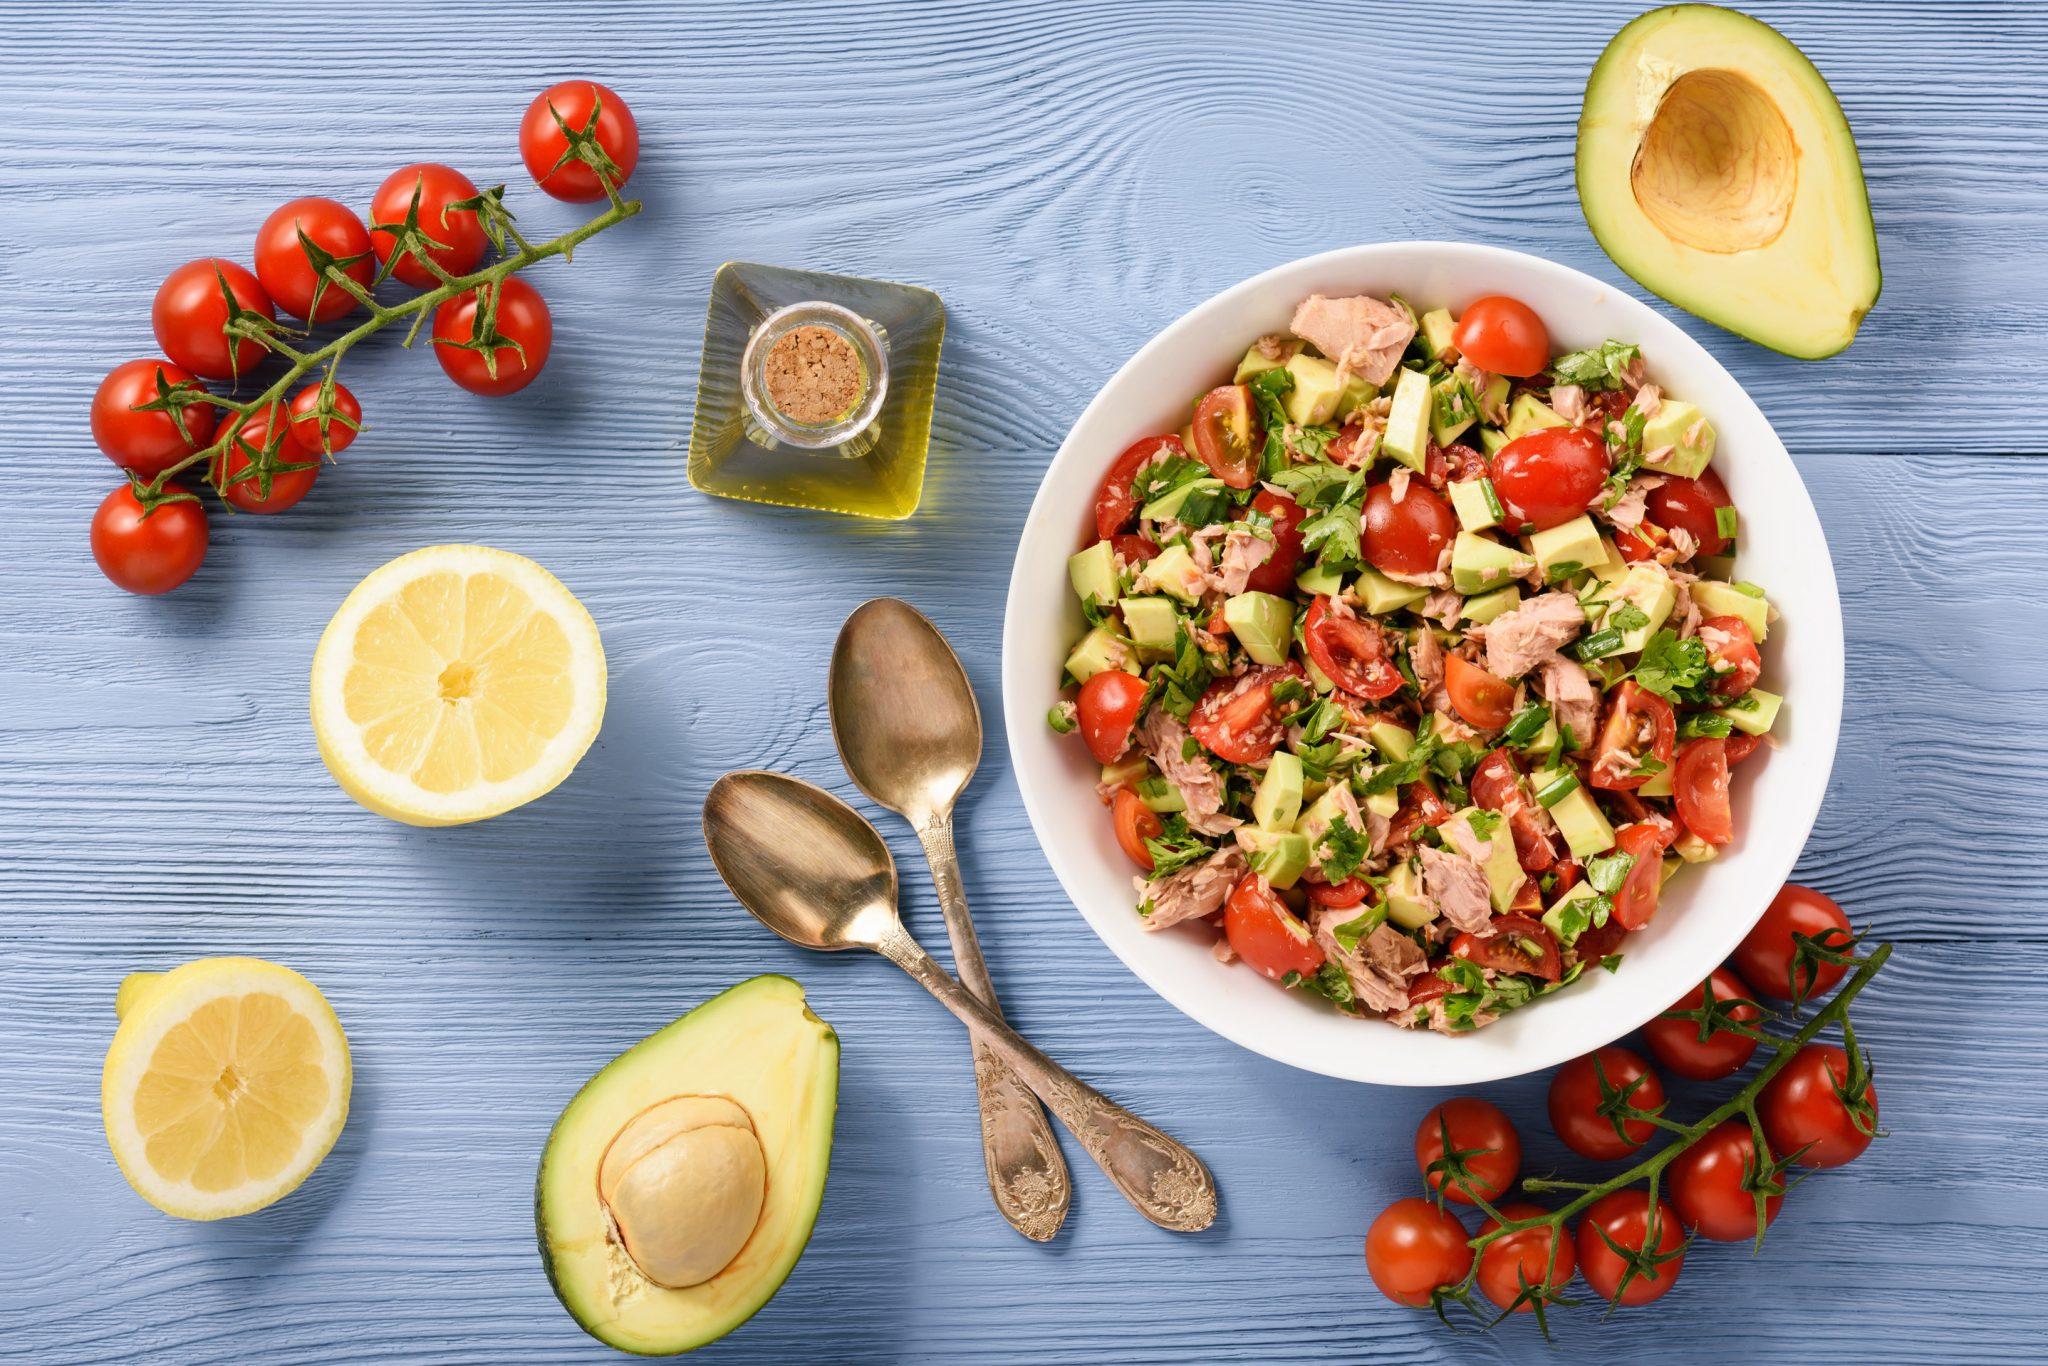 Lemony Avocado Tomato Tuna Salad Recipe